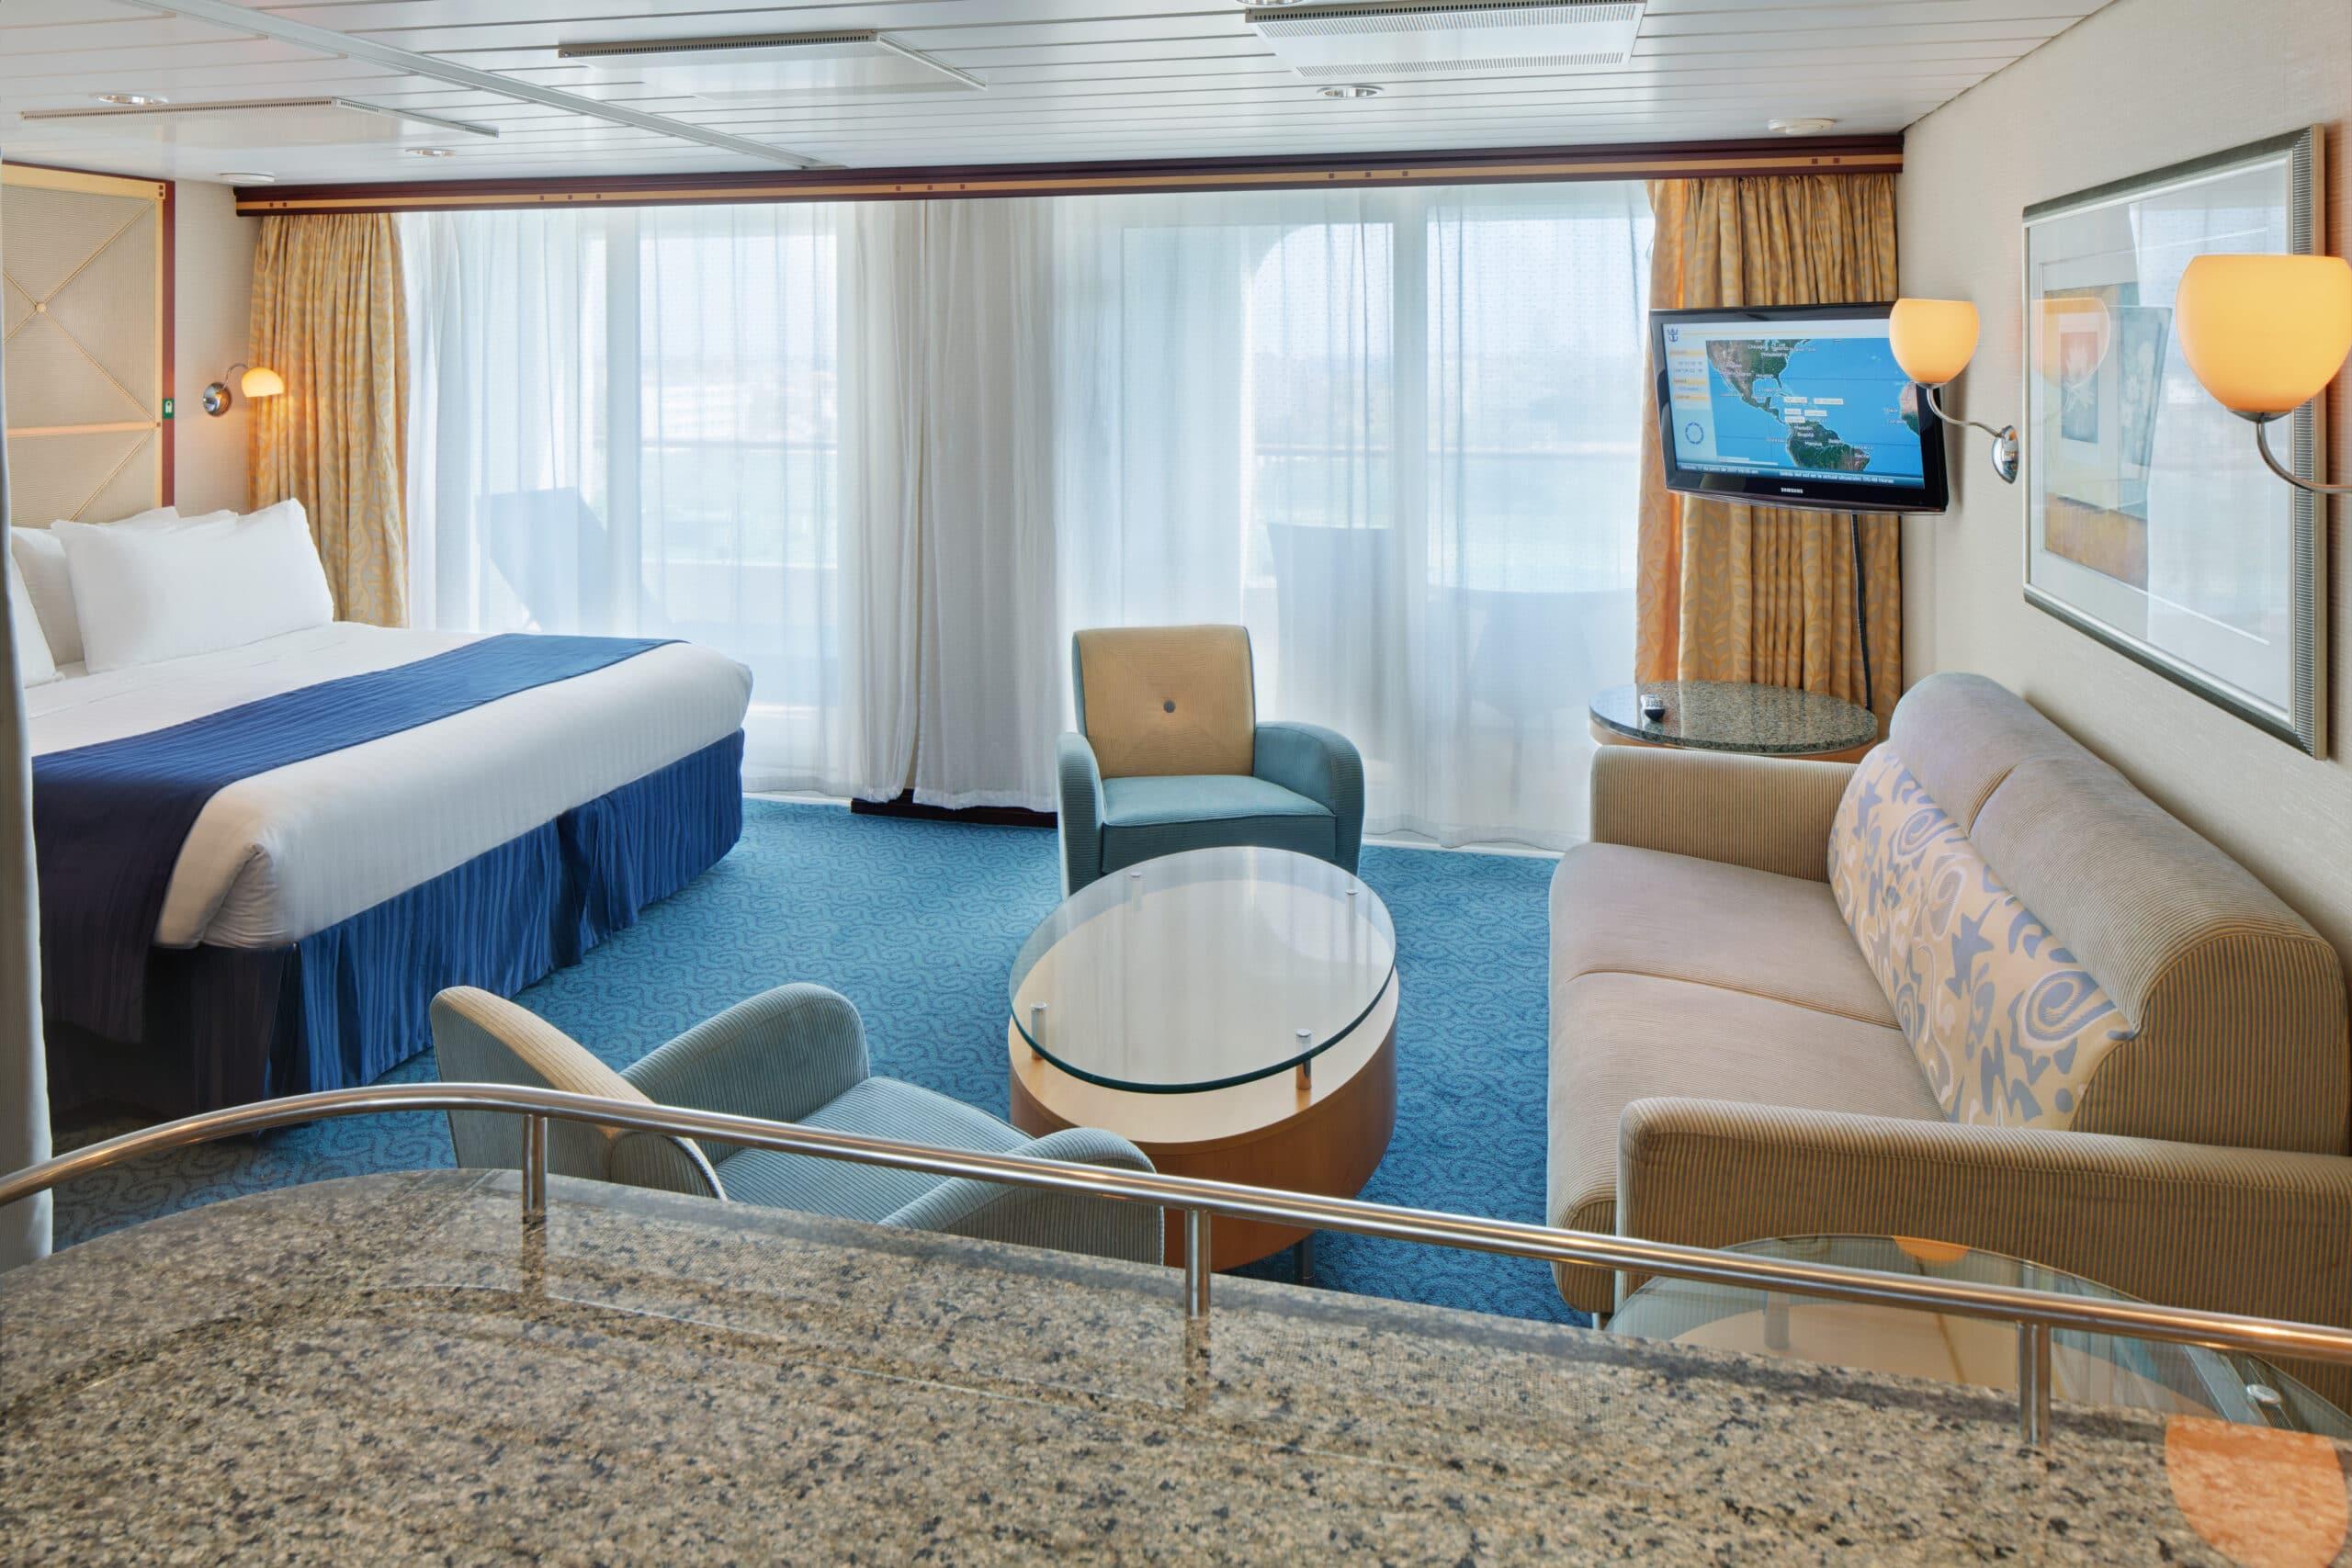 Royal-Caribbean-International-Adventure-of-the-Seas-schip-cruiseschip-categorie-GS-Grand-Suite